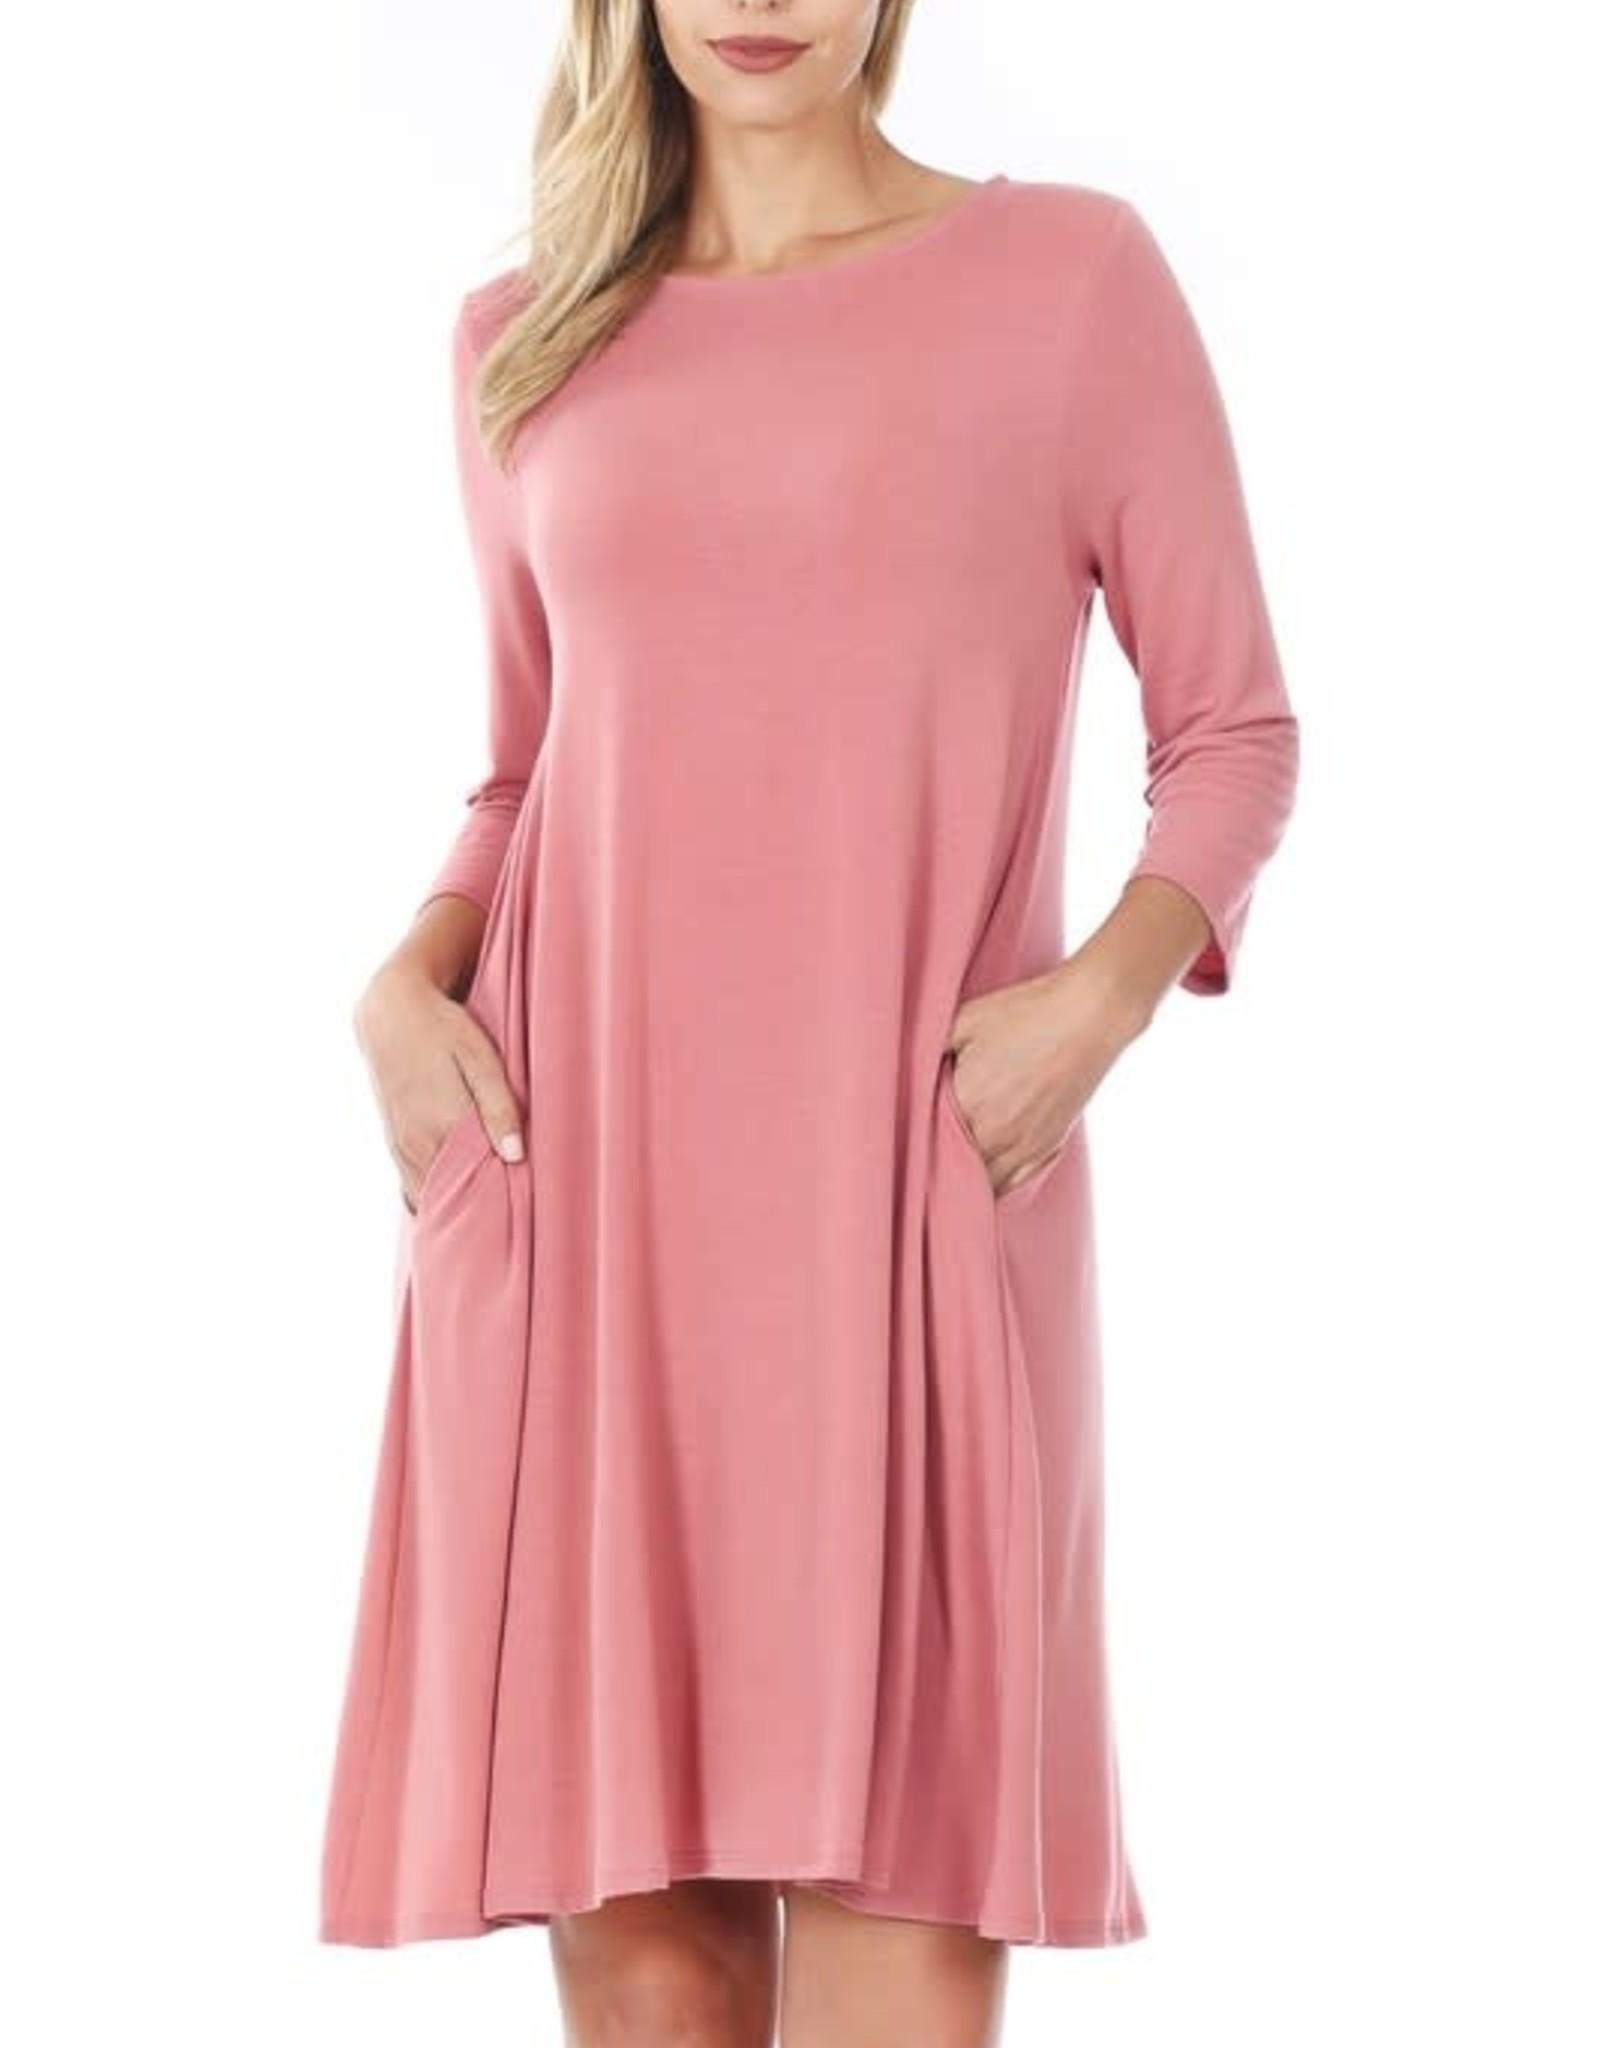 - Dusty Rose 3/4 Sleeve Flare Dress w/Pockets